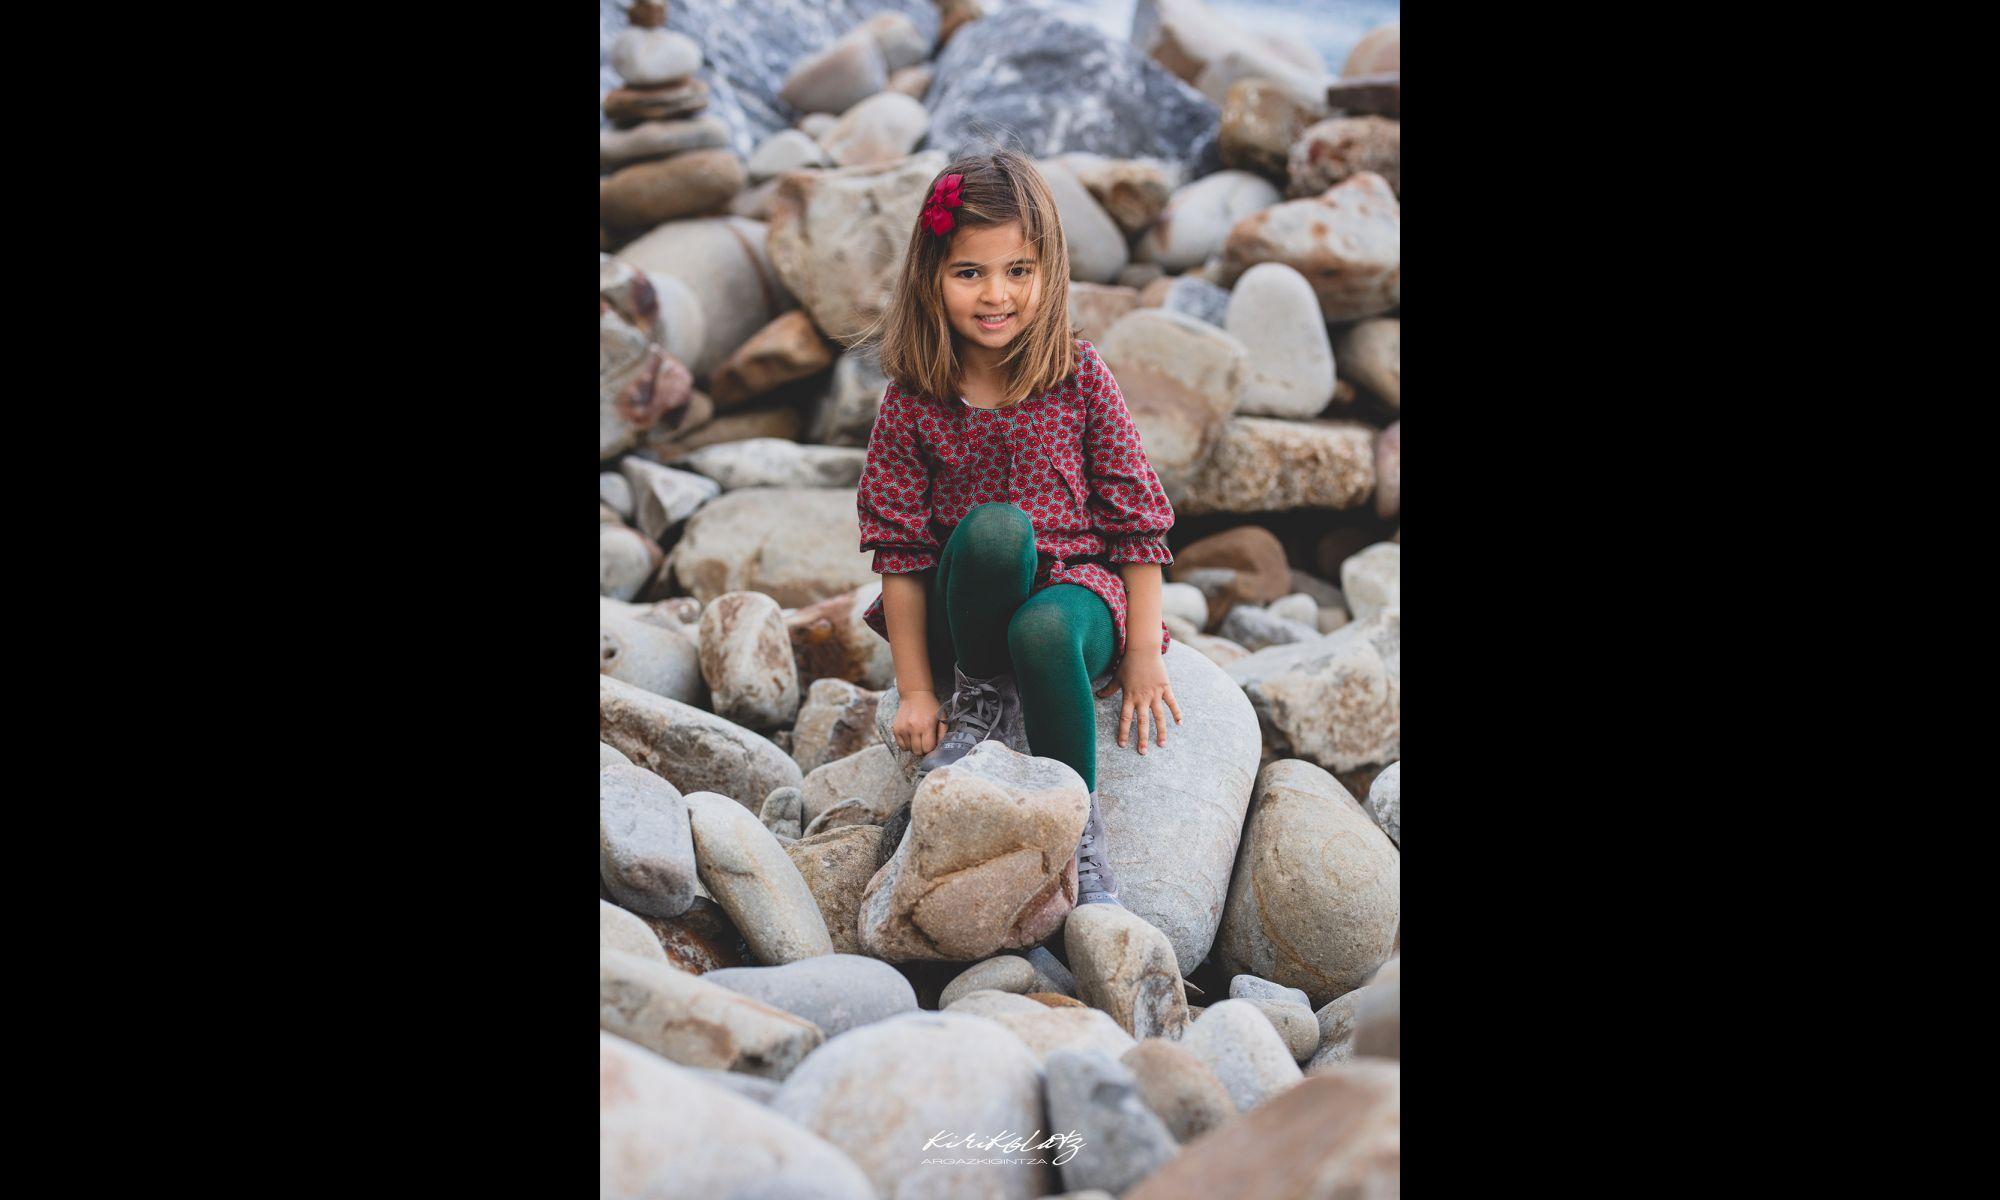 Fotografia Infantil Sesiones Familiares Retratos Bizkaia Arribolas